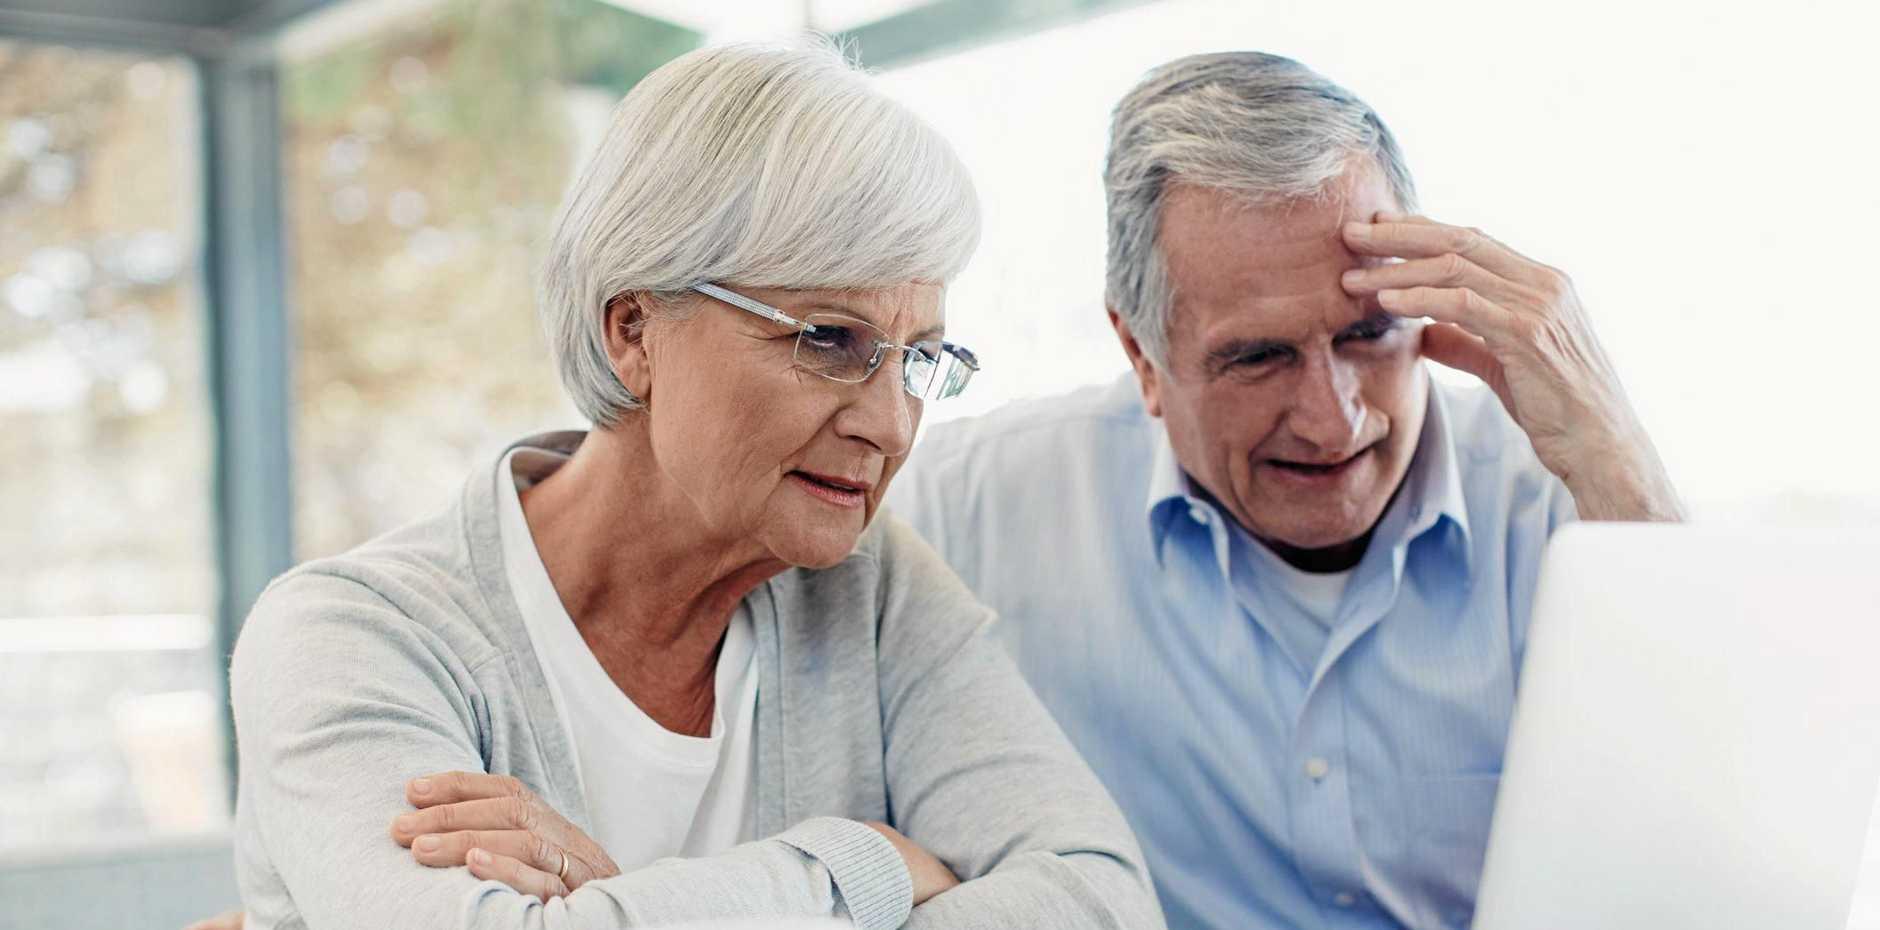 Senior Online Dating Services Online Dating Site